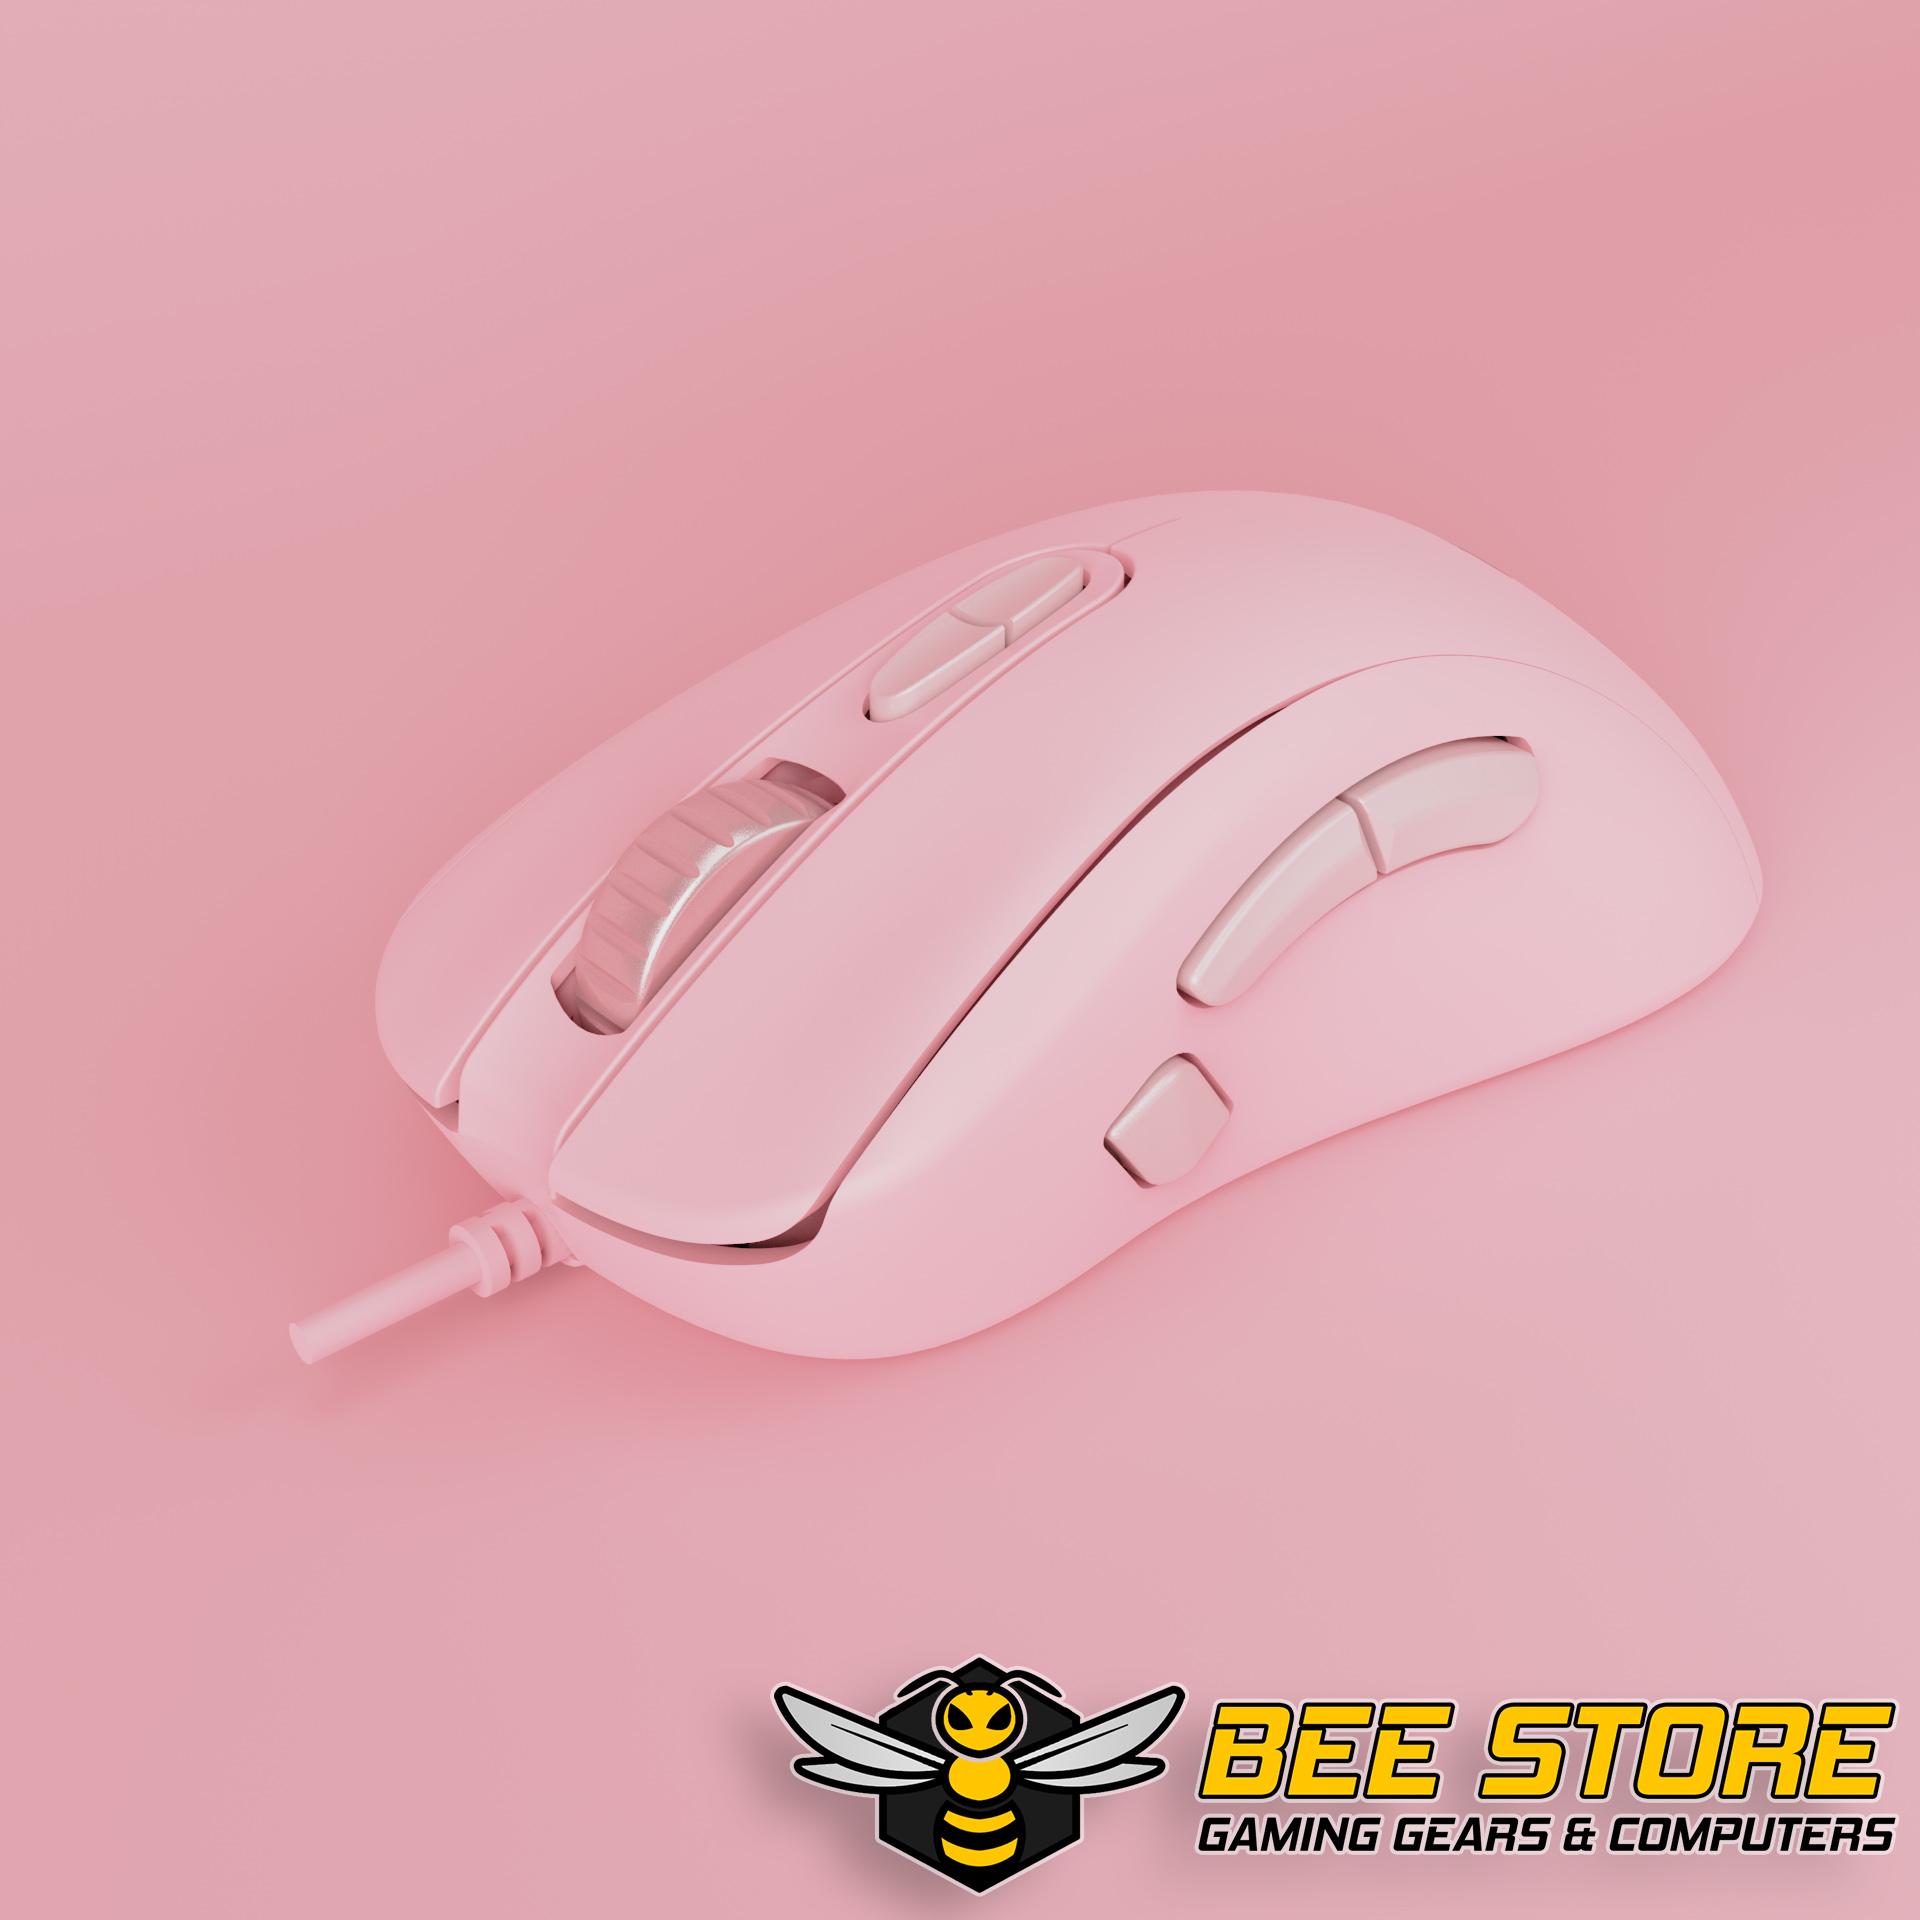 chuot-gaming-akko-rg389-pink-beegaming-10